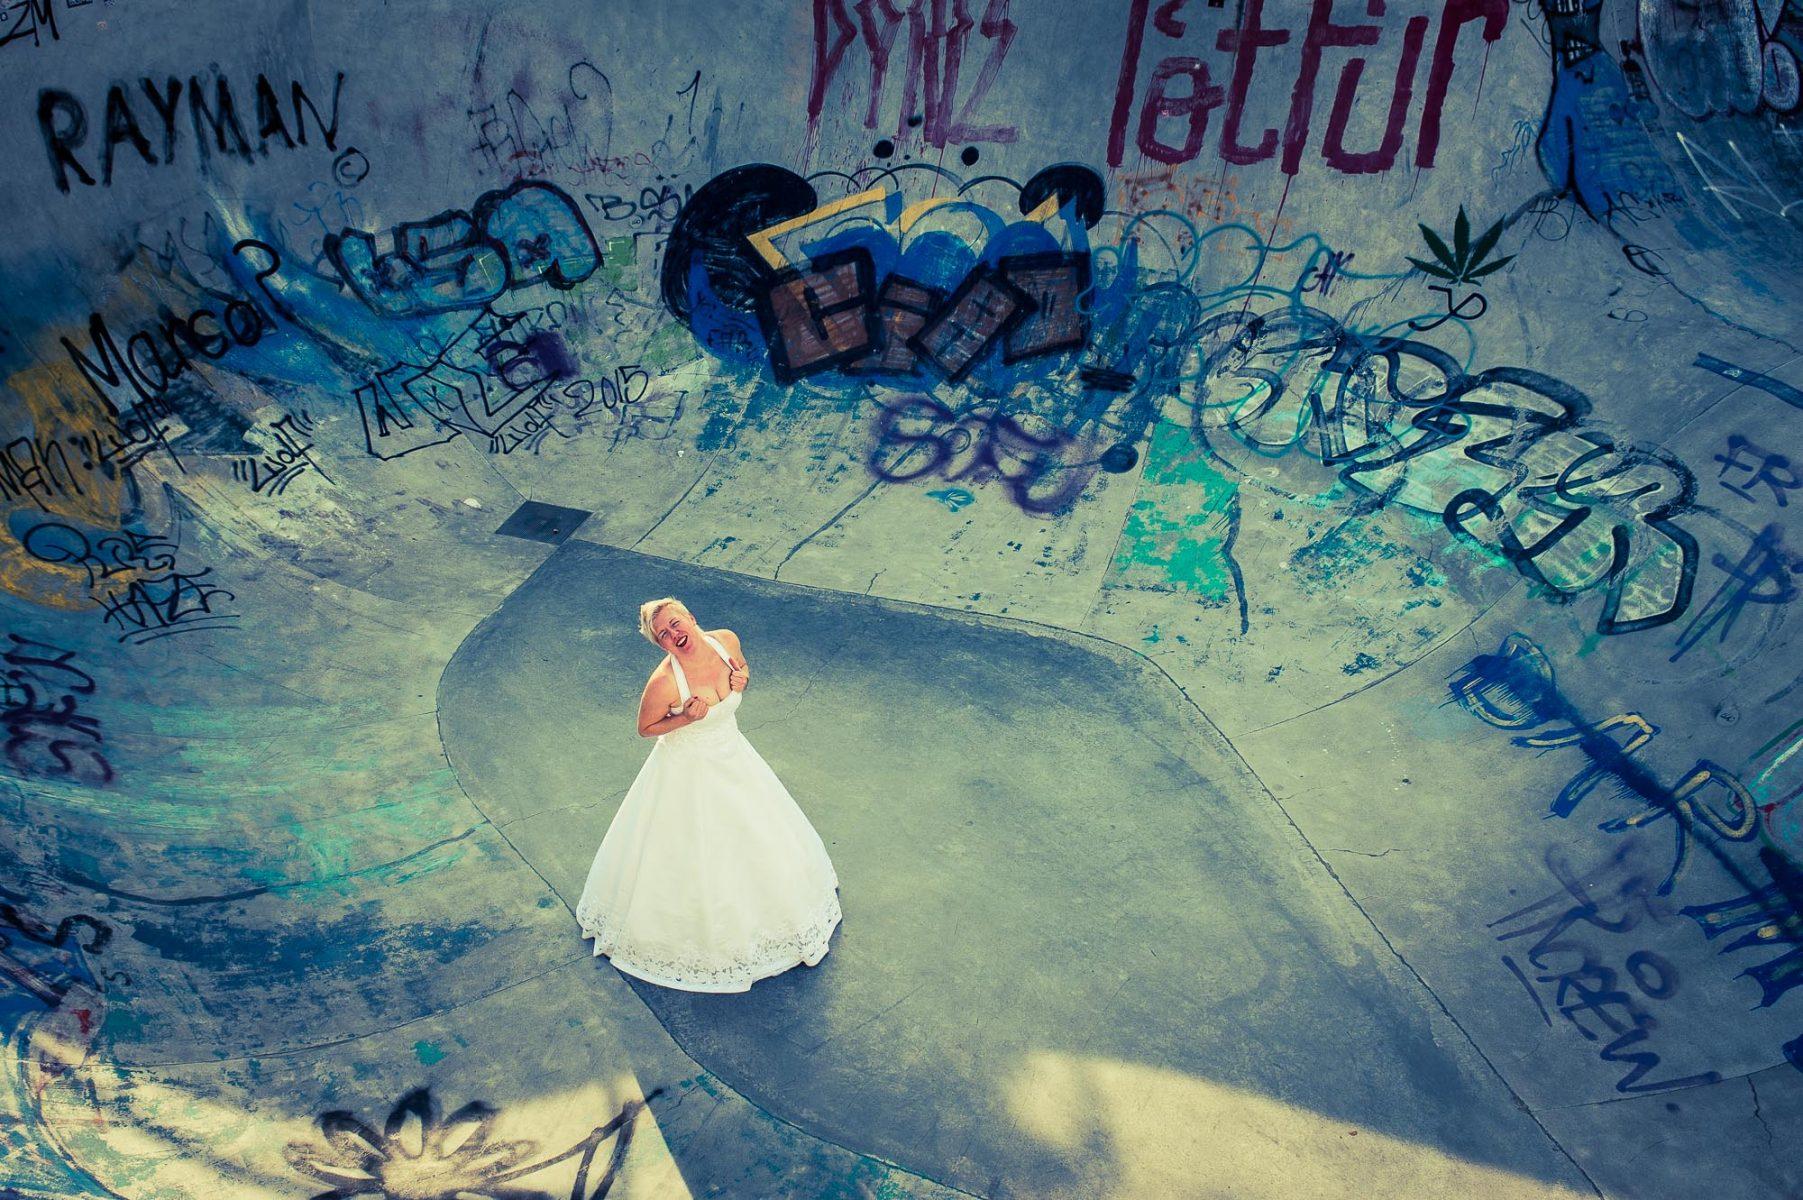 Hochzeit B2000  225833 239 1803x1200 - TRASH THE DRESS